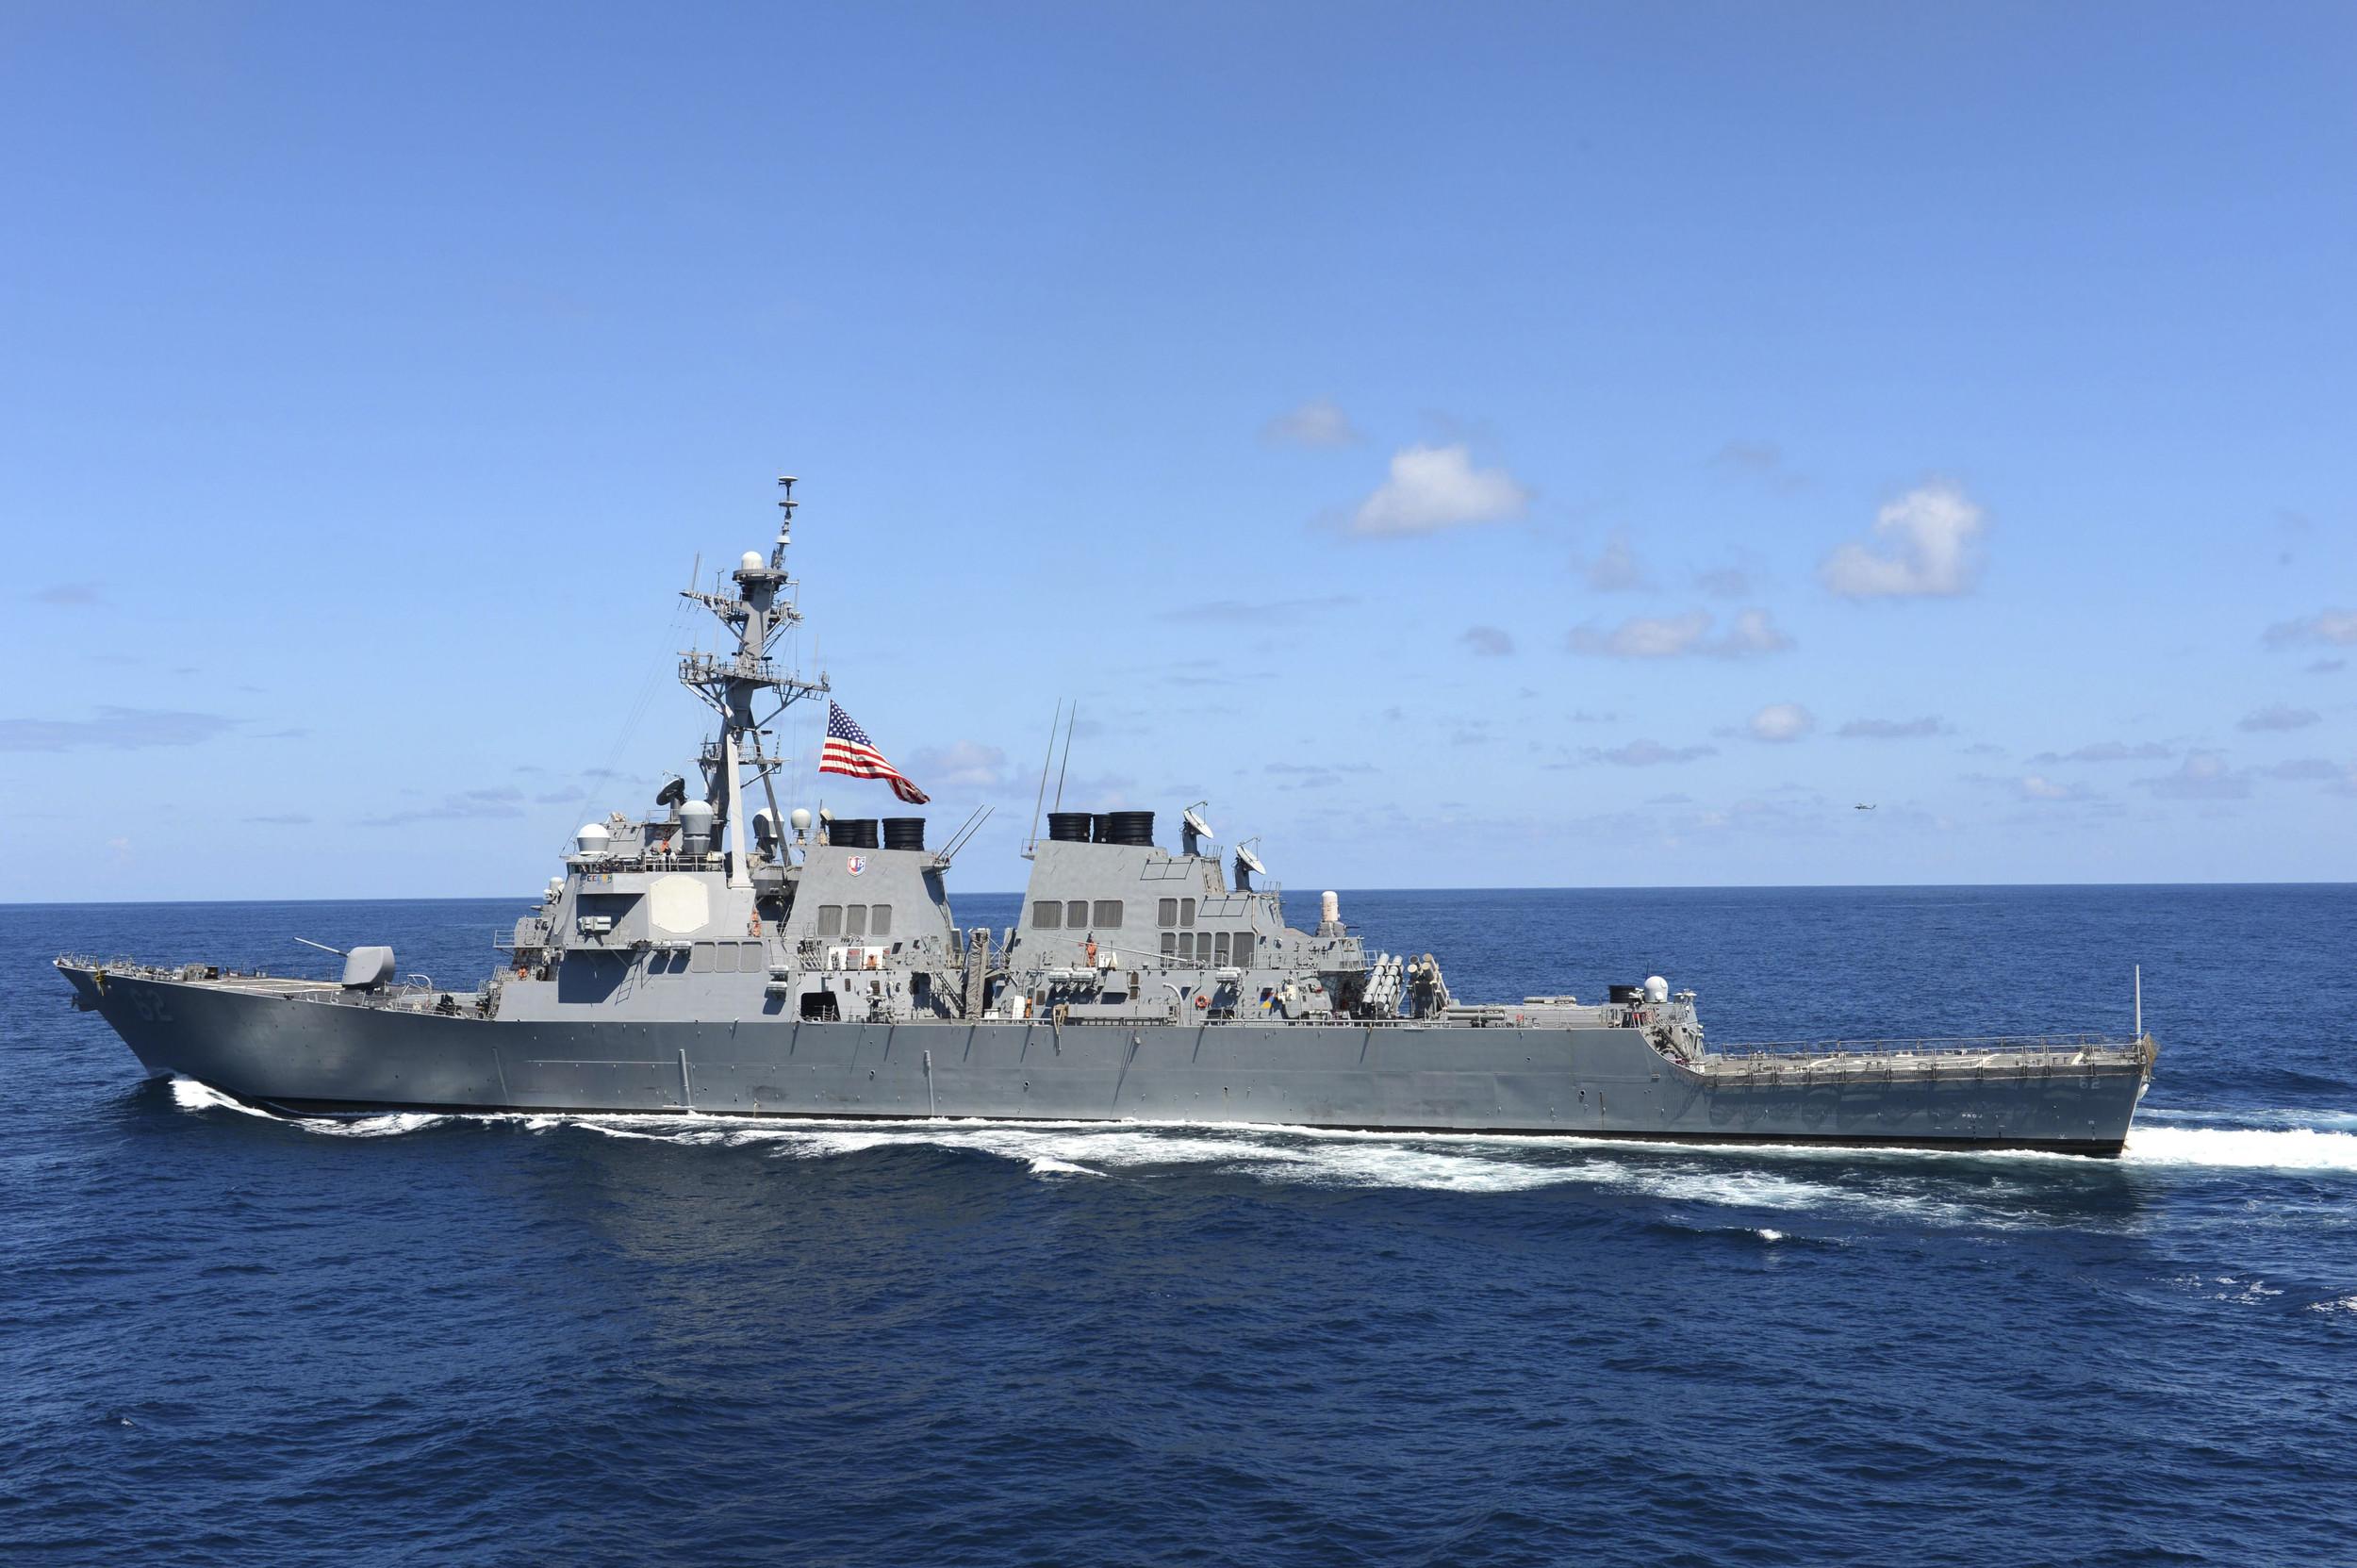 US judge dismisses USS Fitzgerald collision lawsuits for lack of jurisdiction